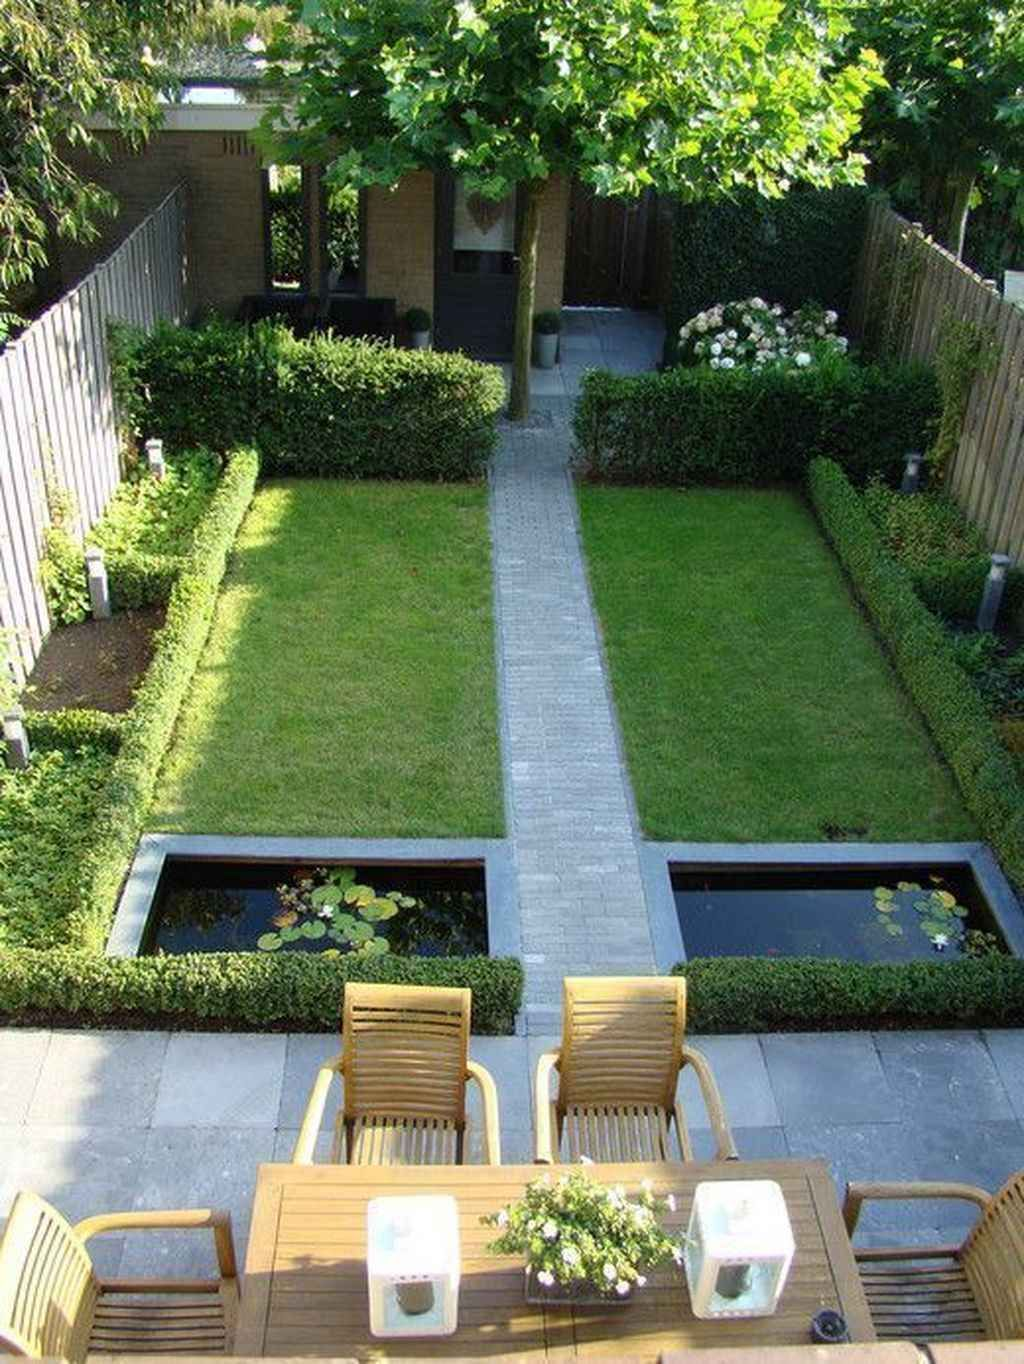 95 Amazing Small Garden Design Ideas Small Backyard Landscaping Small Garden Landscape Small Garden Design